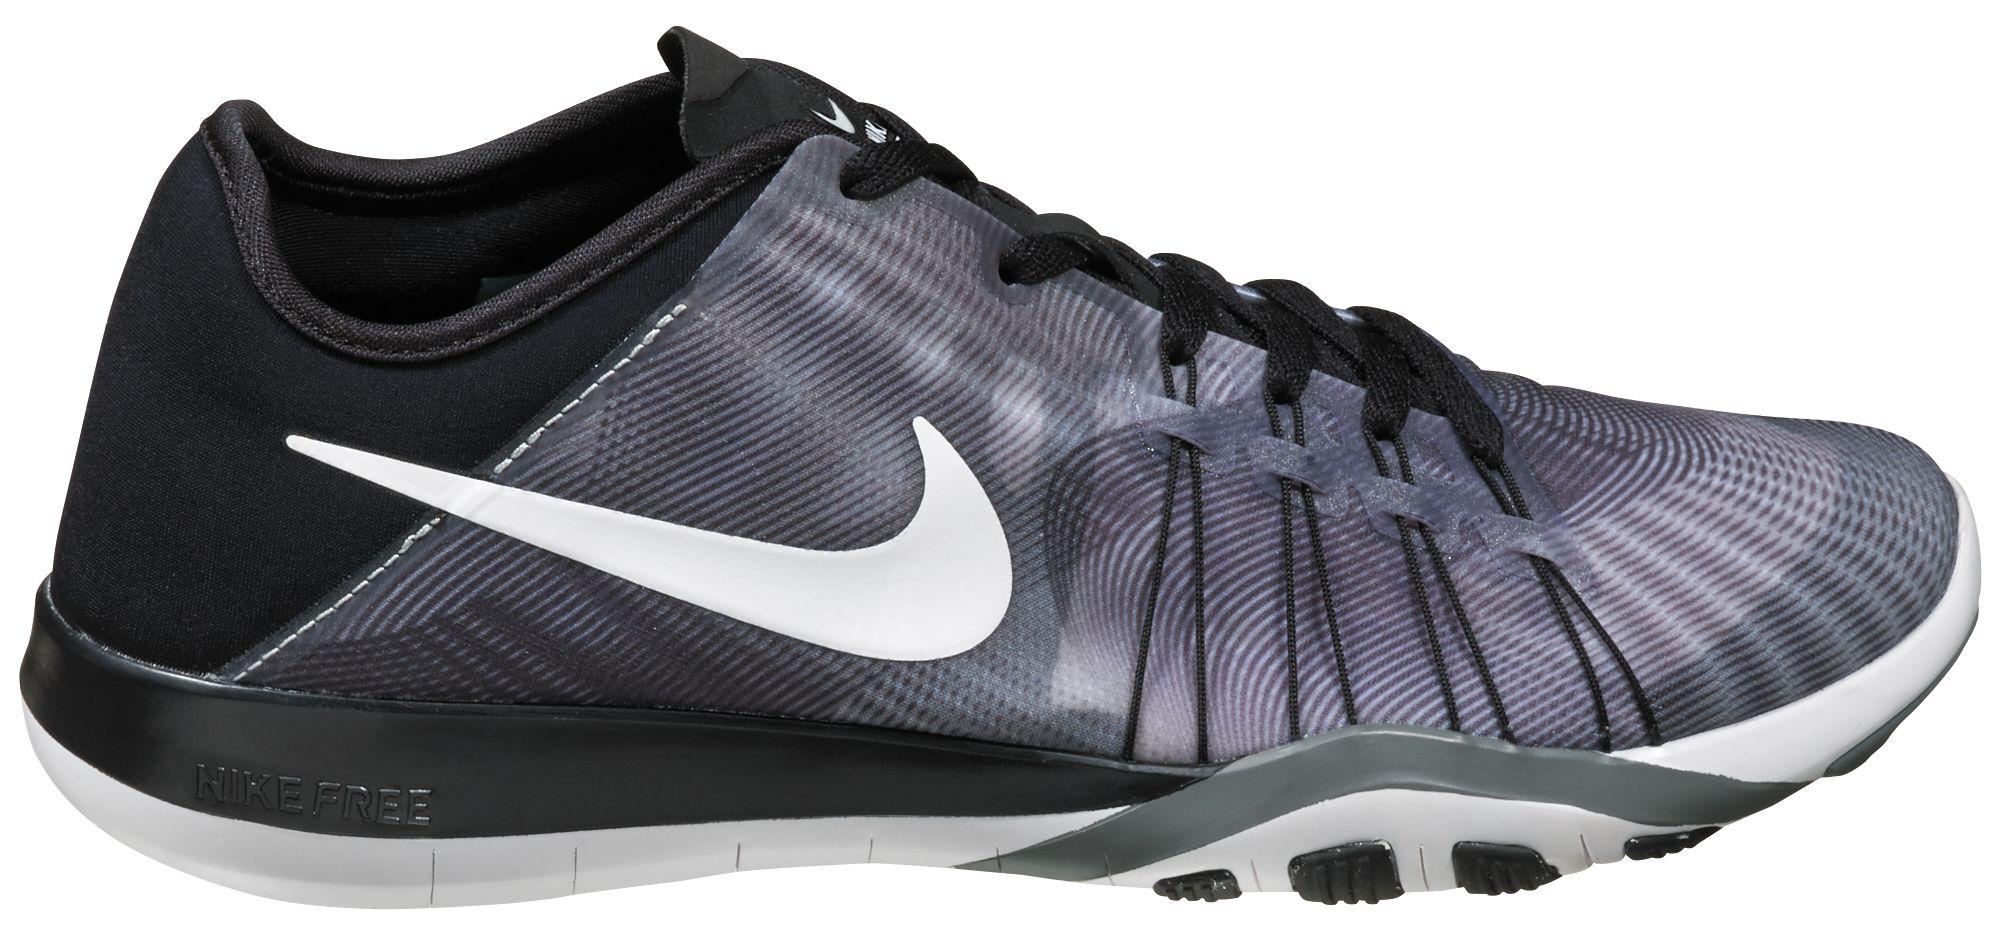 online store 82c19 f0ccc ... Nike Womens Free TR 6 PRT Training Shoes ...